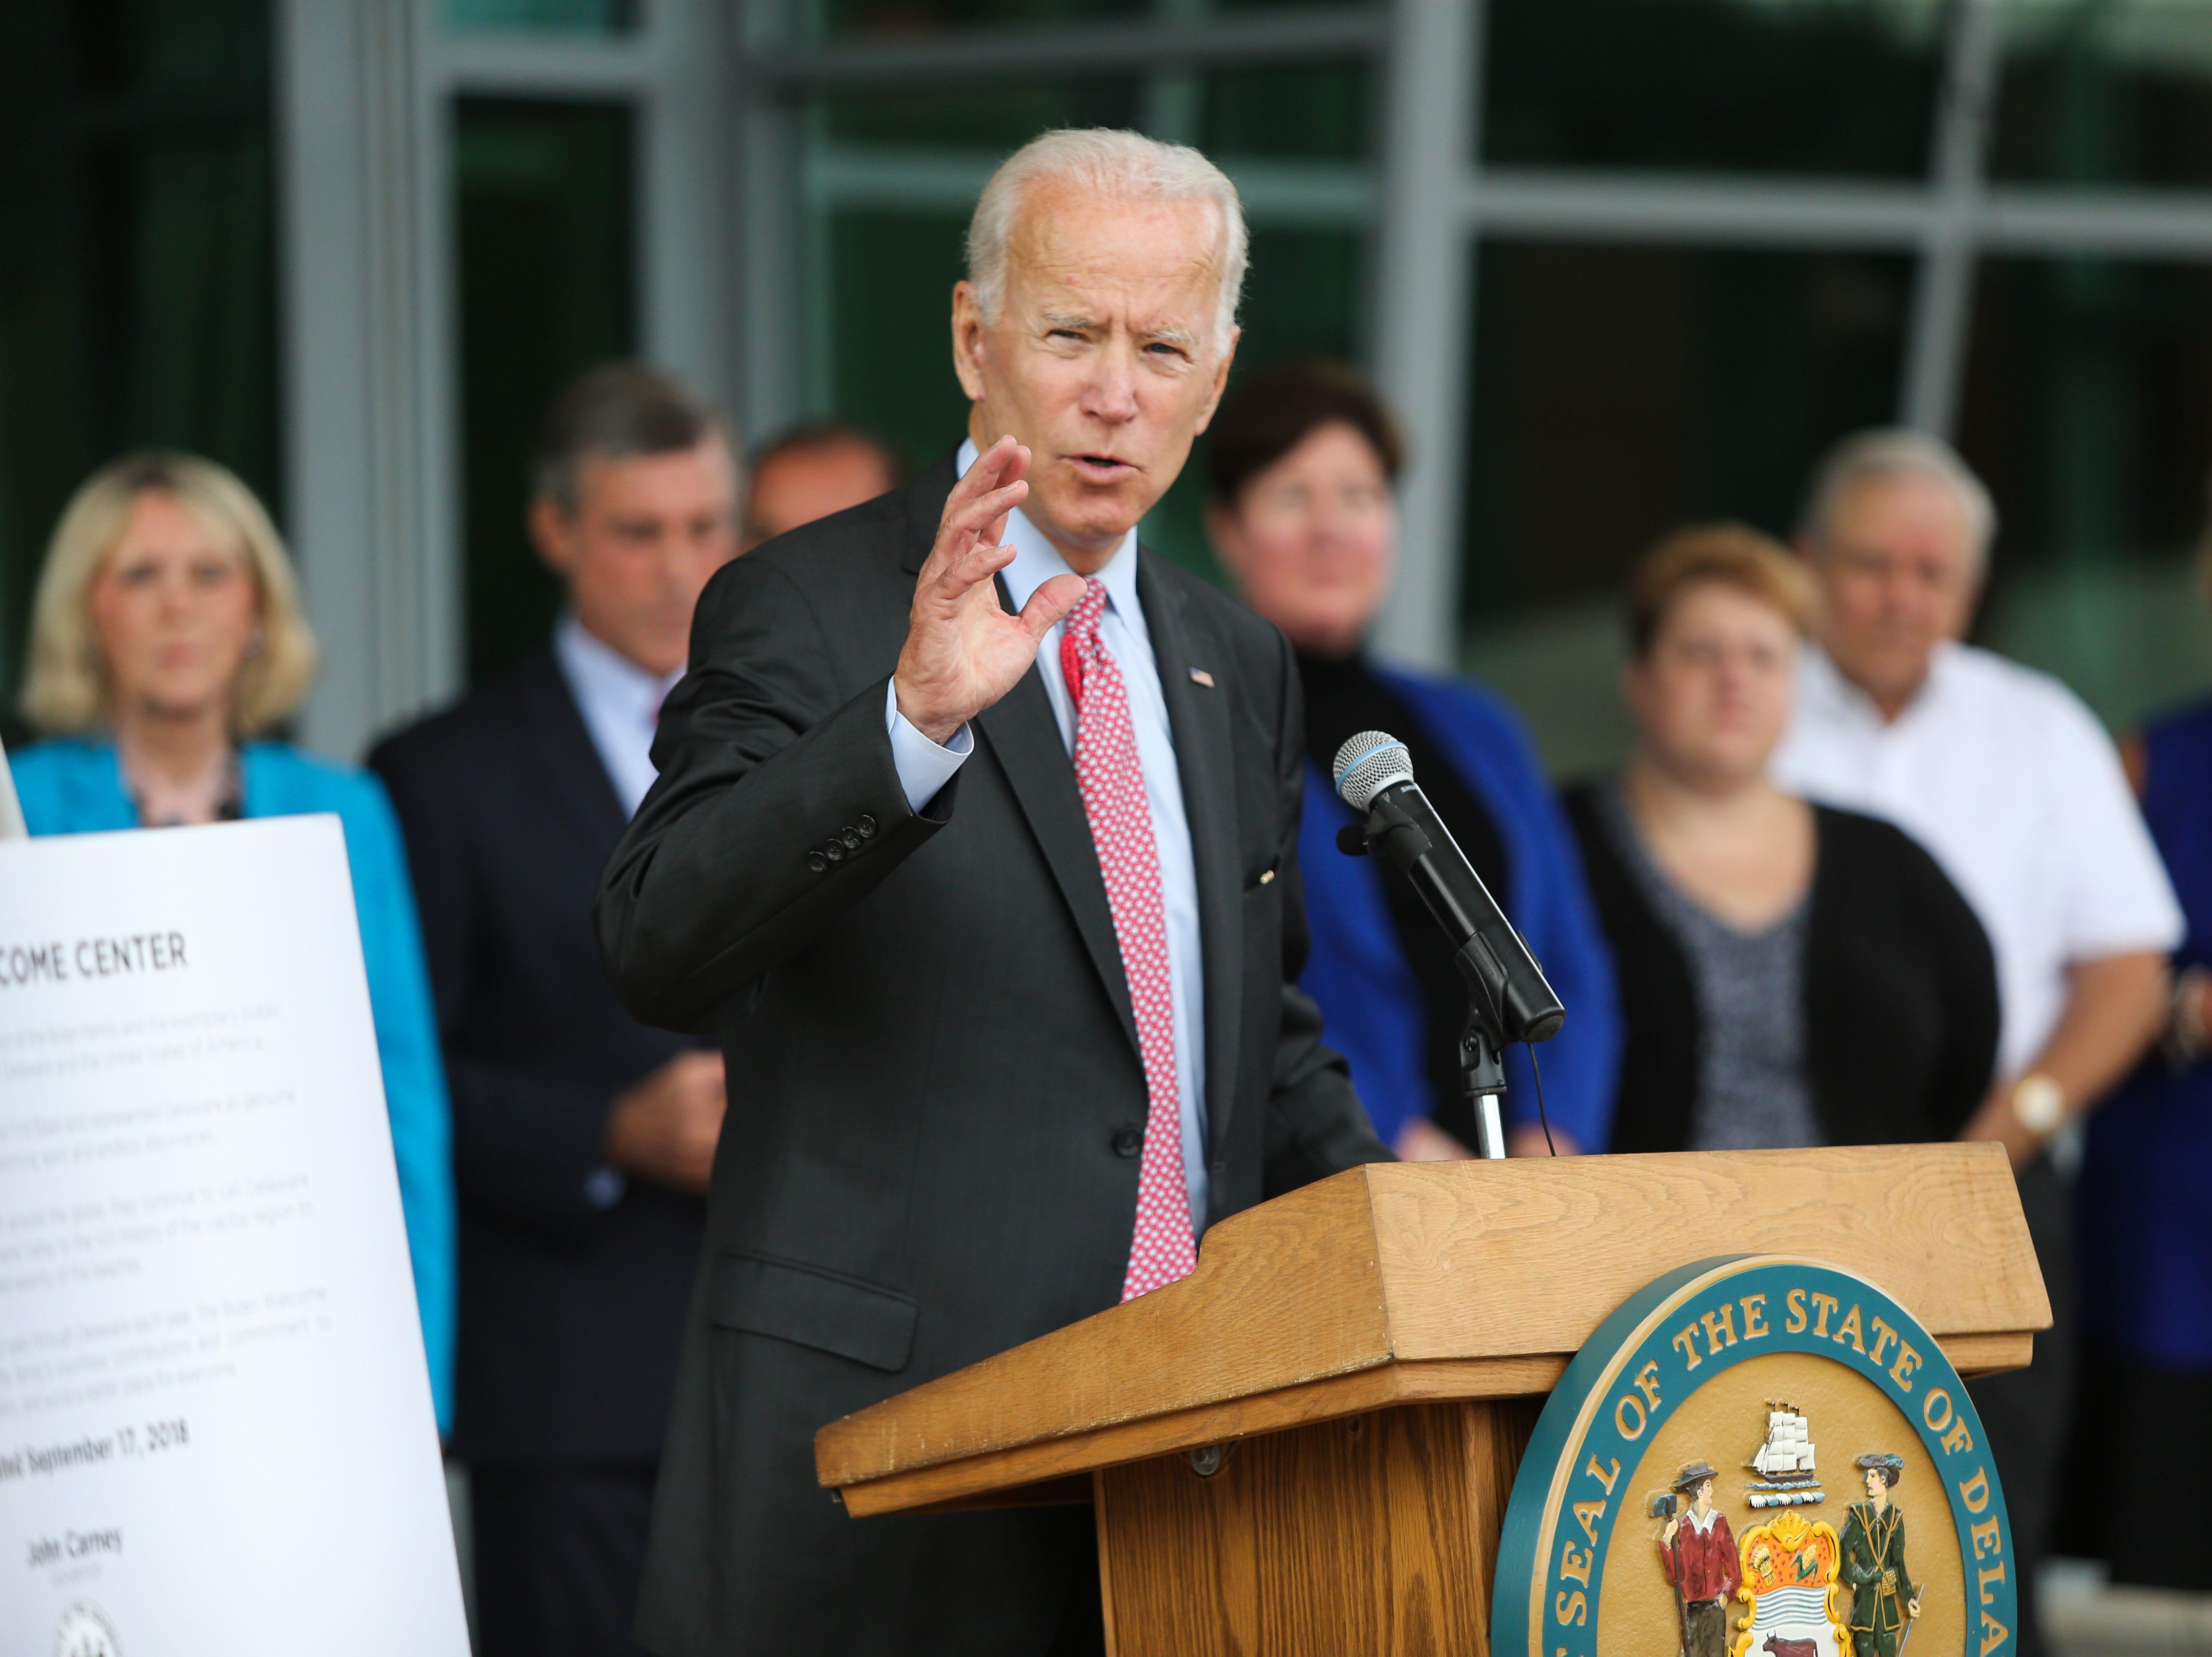 'Meat on the bone:' How Joe Biden changed the practice, ideology of Delaware politics